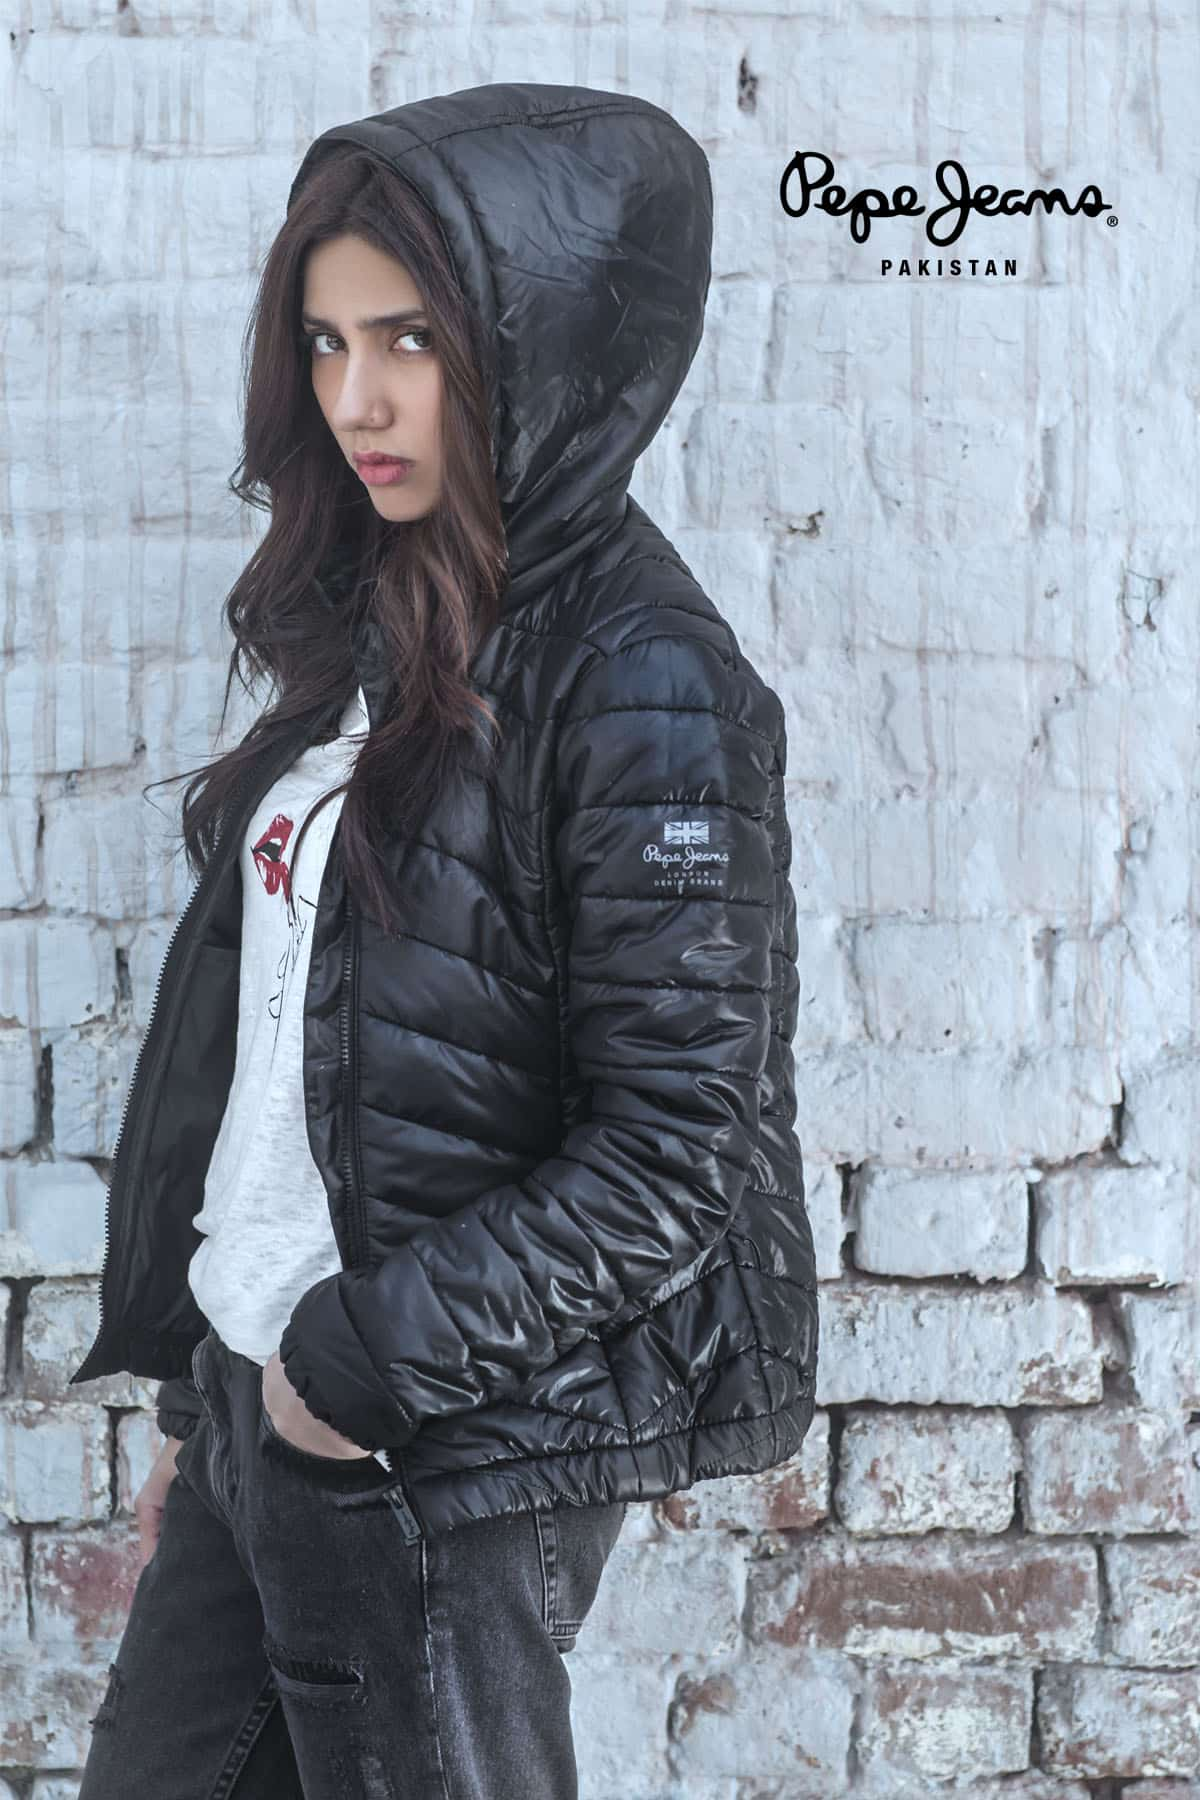 Mahira Khan for Pepe Jeans Pakistan Winter 2015 Campaign – #MKLovesPepe (12)